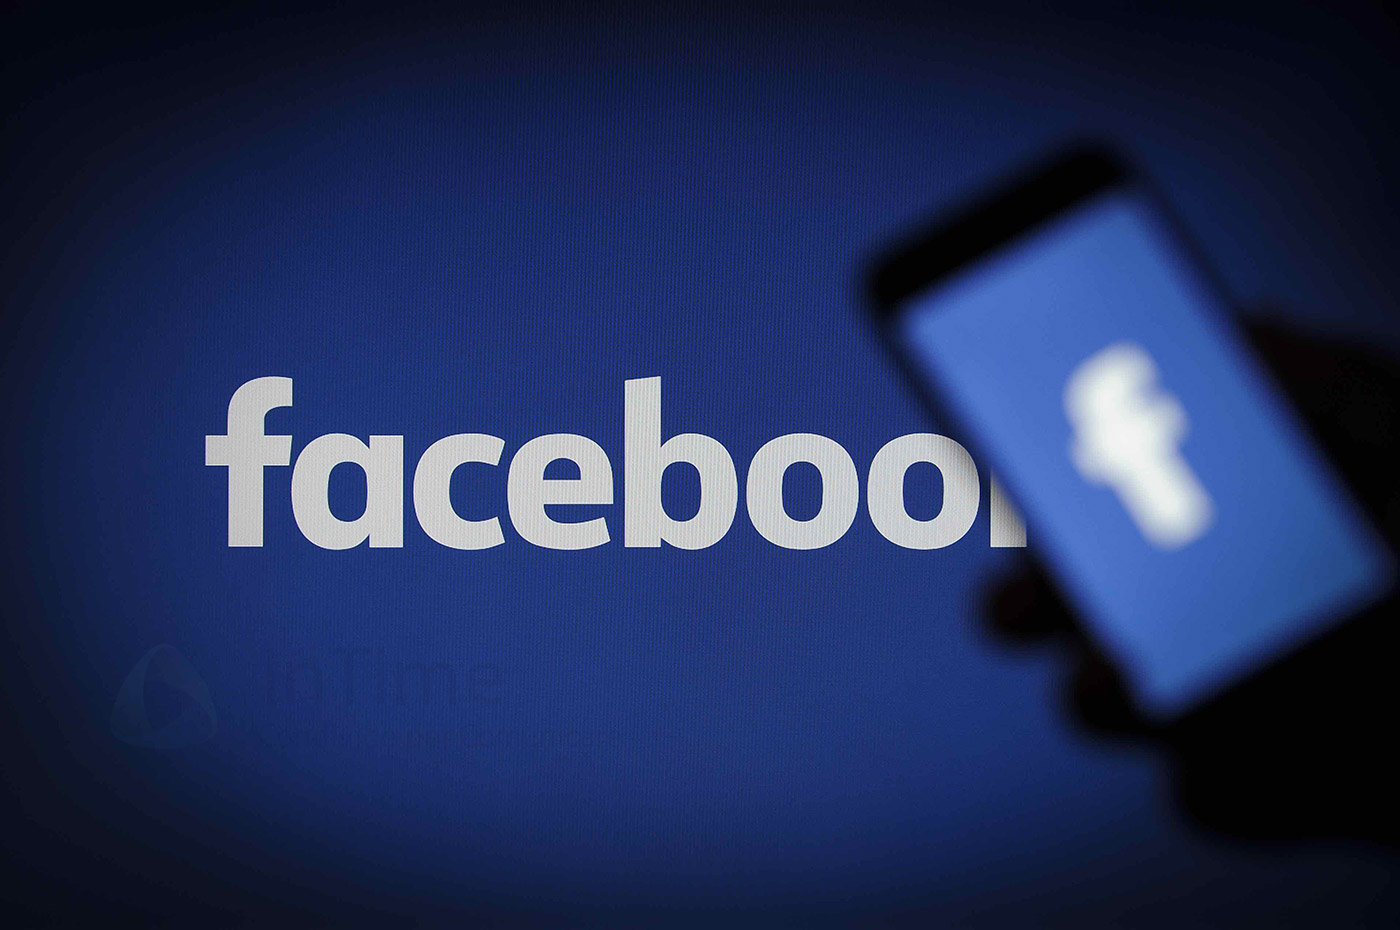 Facebook multata per 10 milioni di euro dall'Antitrust